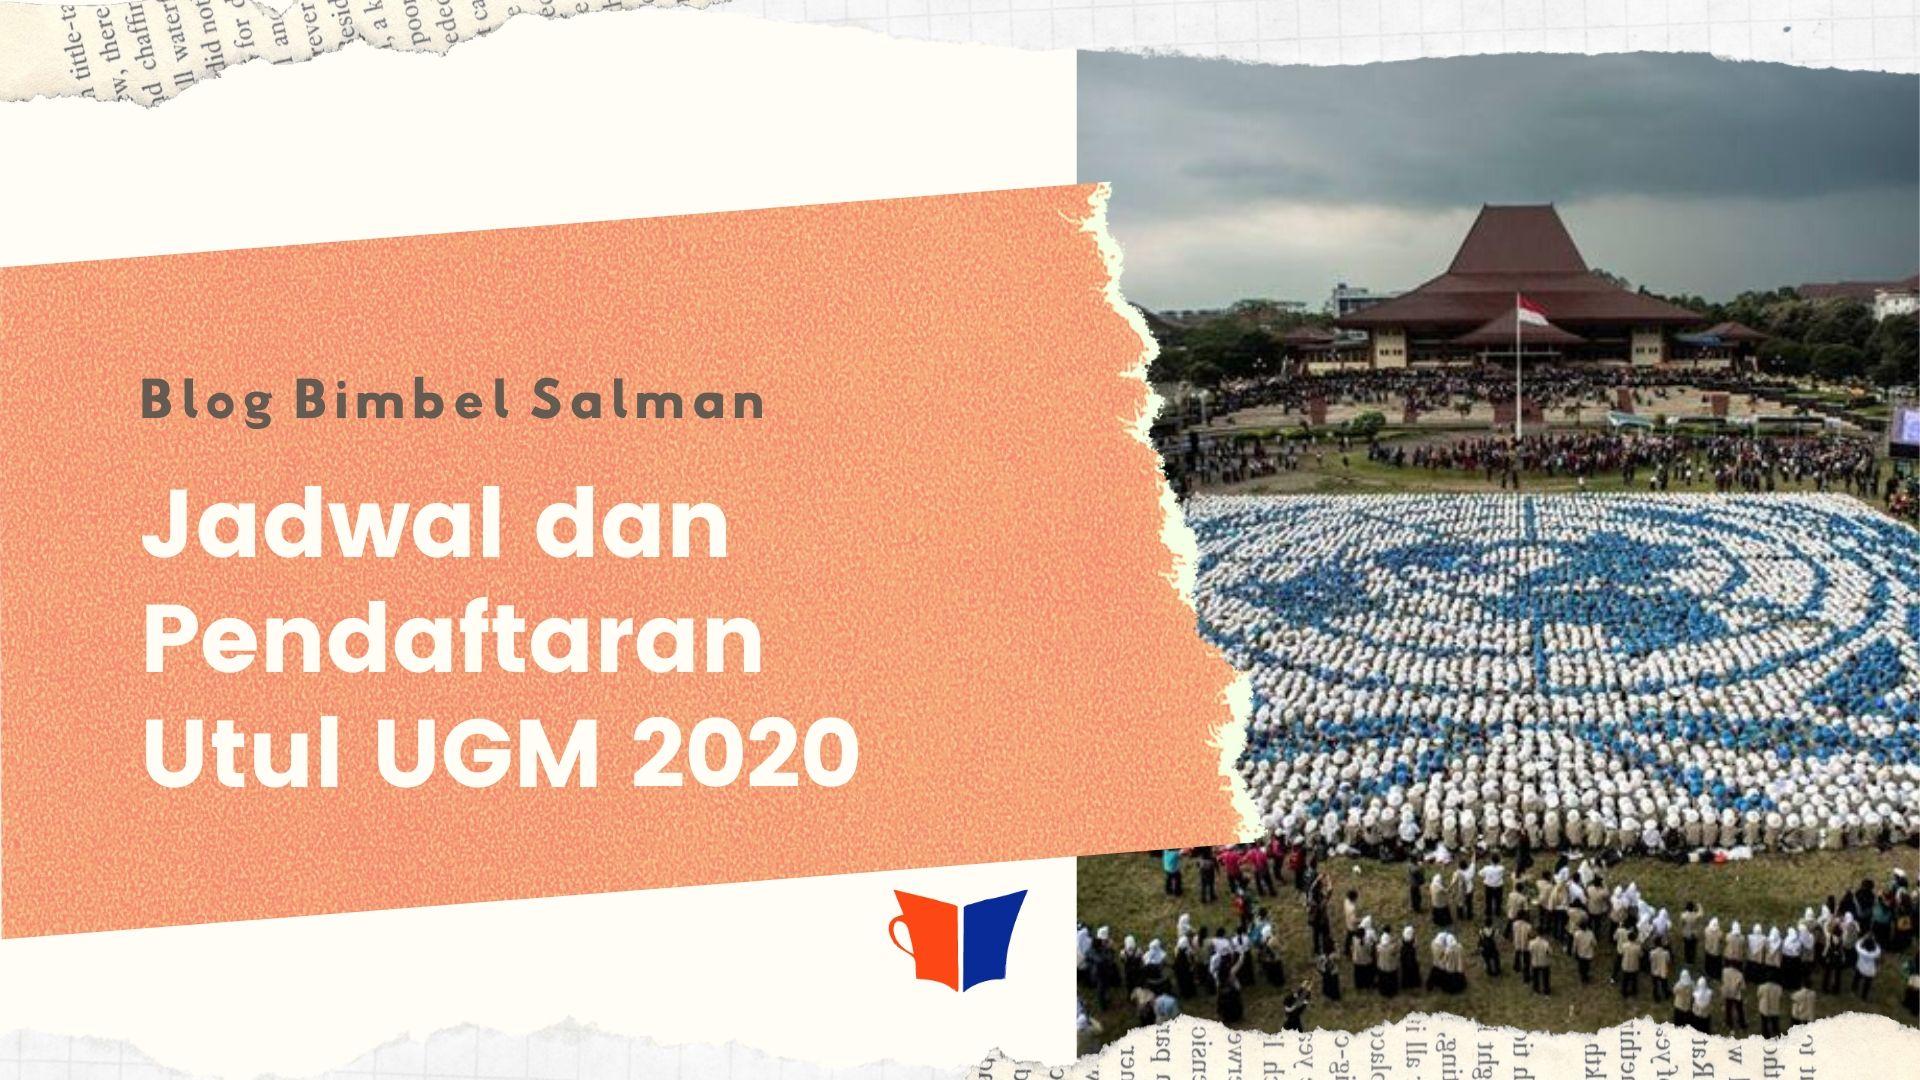 pendaftaran UTUL UGM 2020